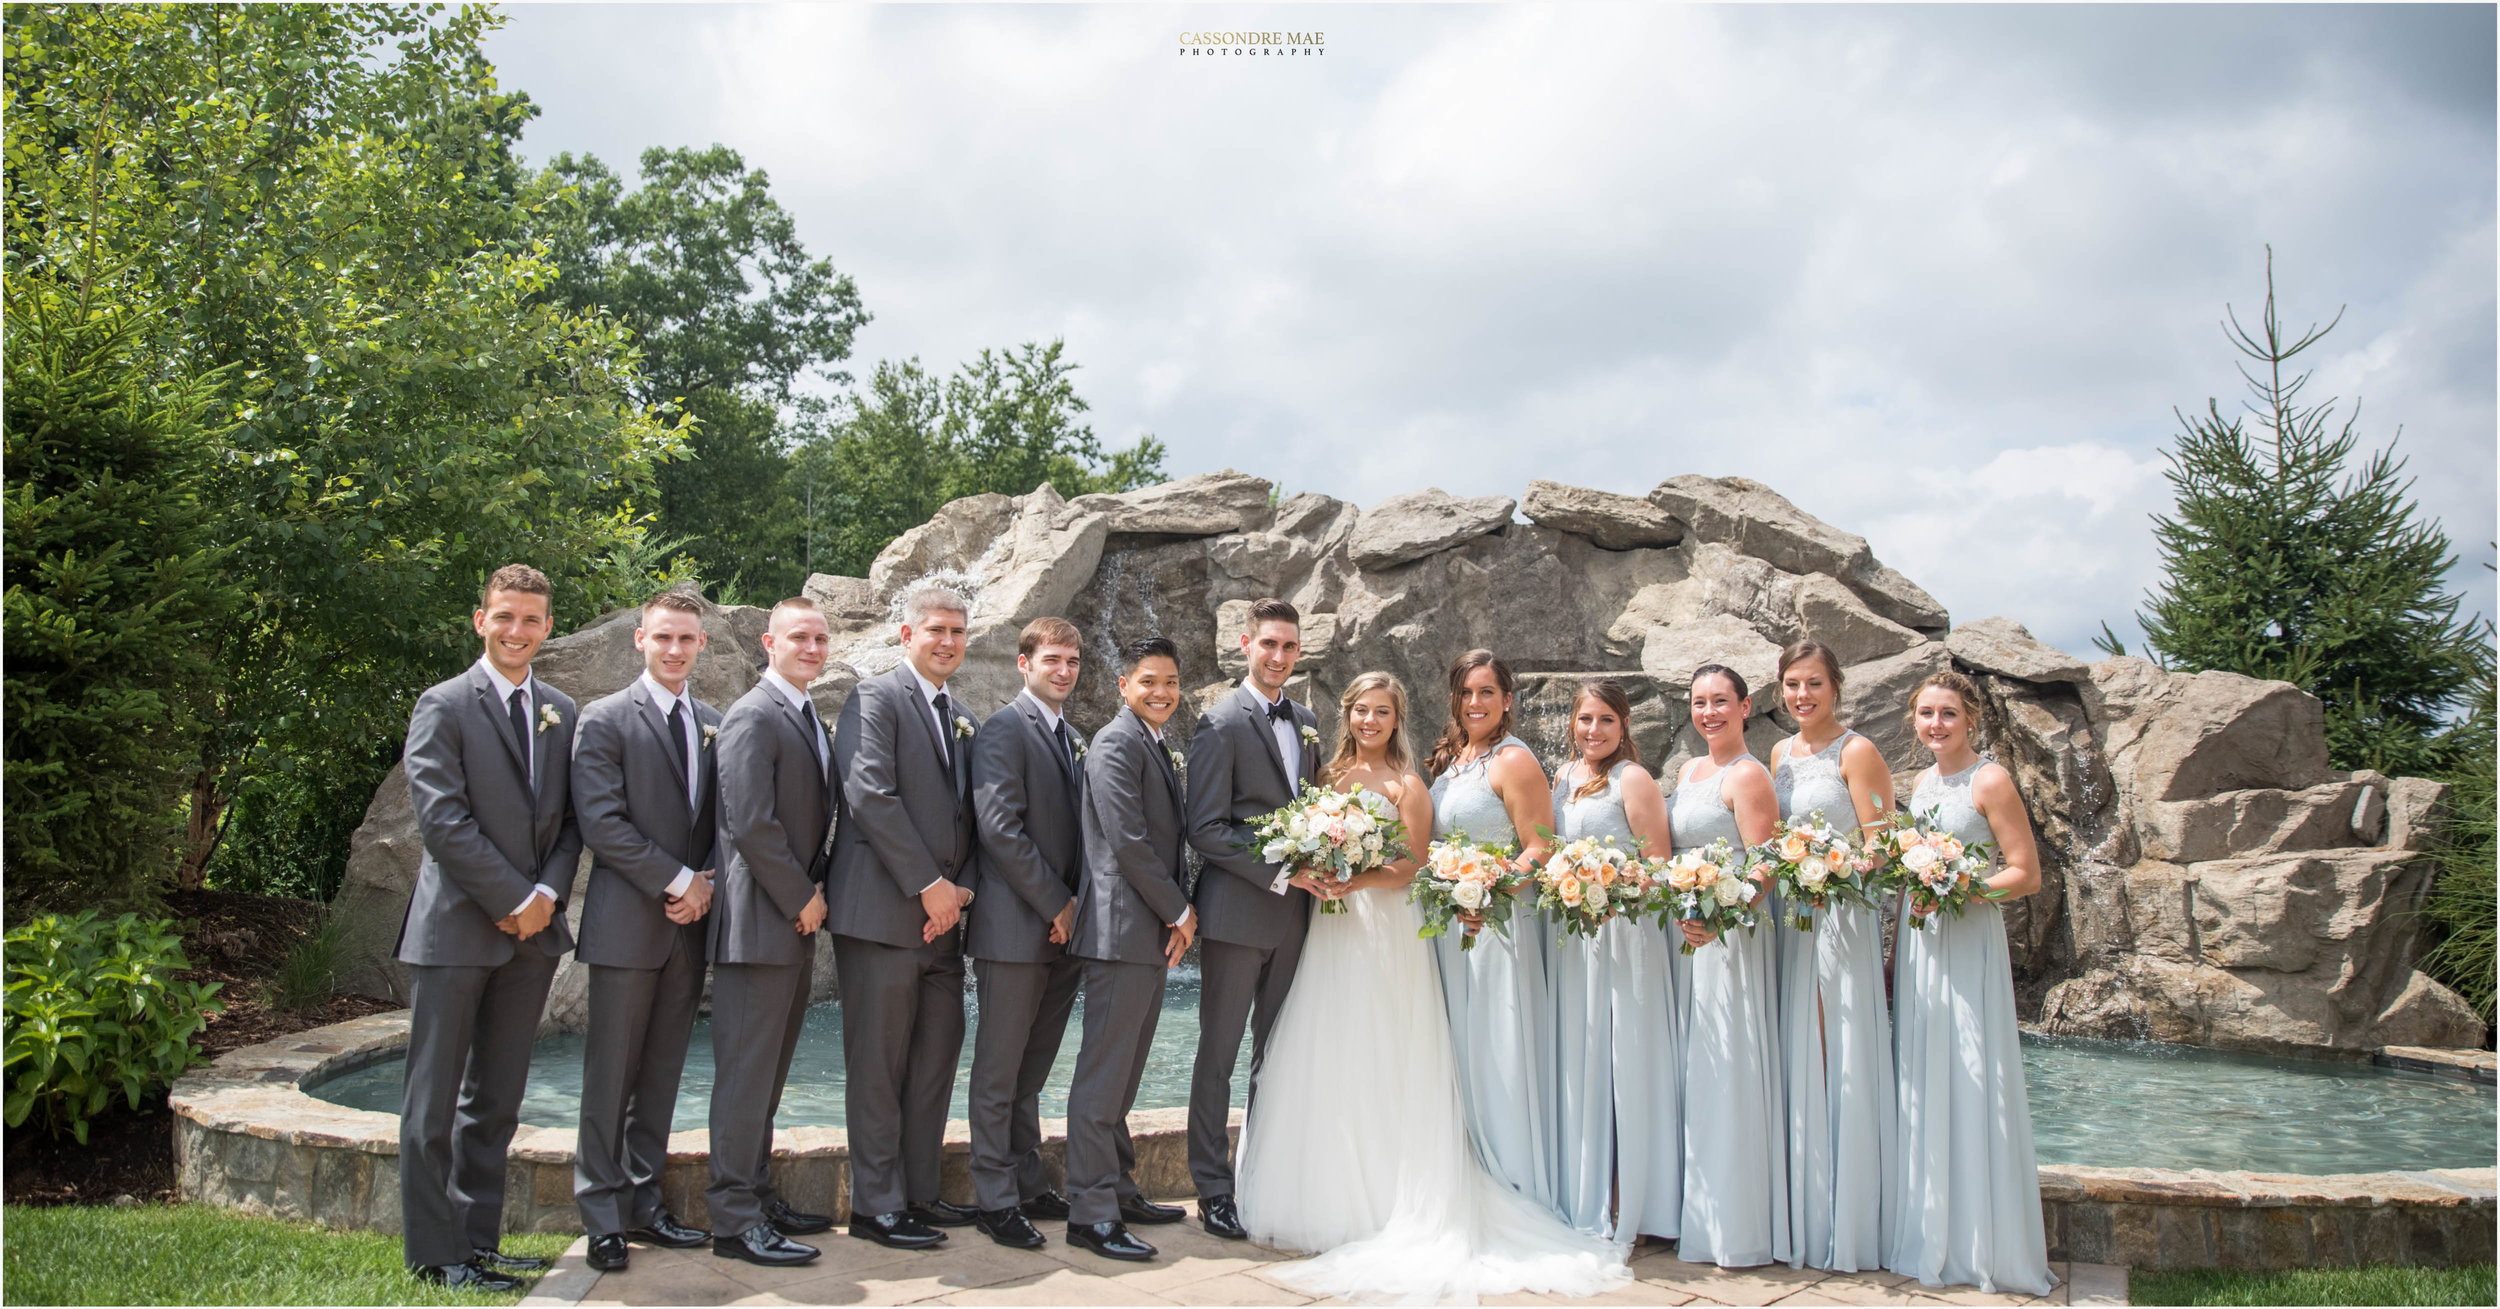 Cassondre Mae Photography Hudson Valley NY Wedding Photographer -15.jpg